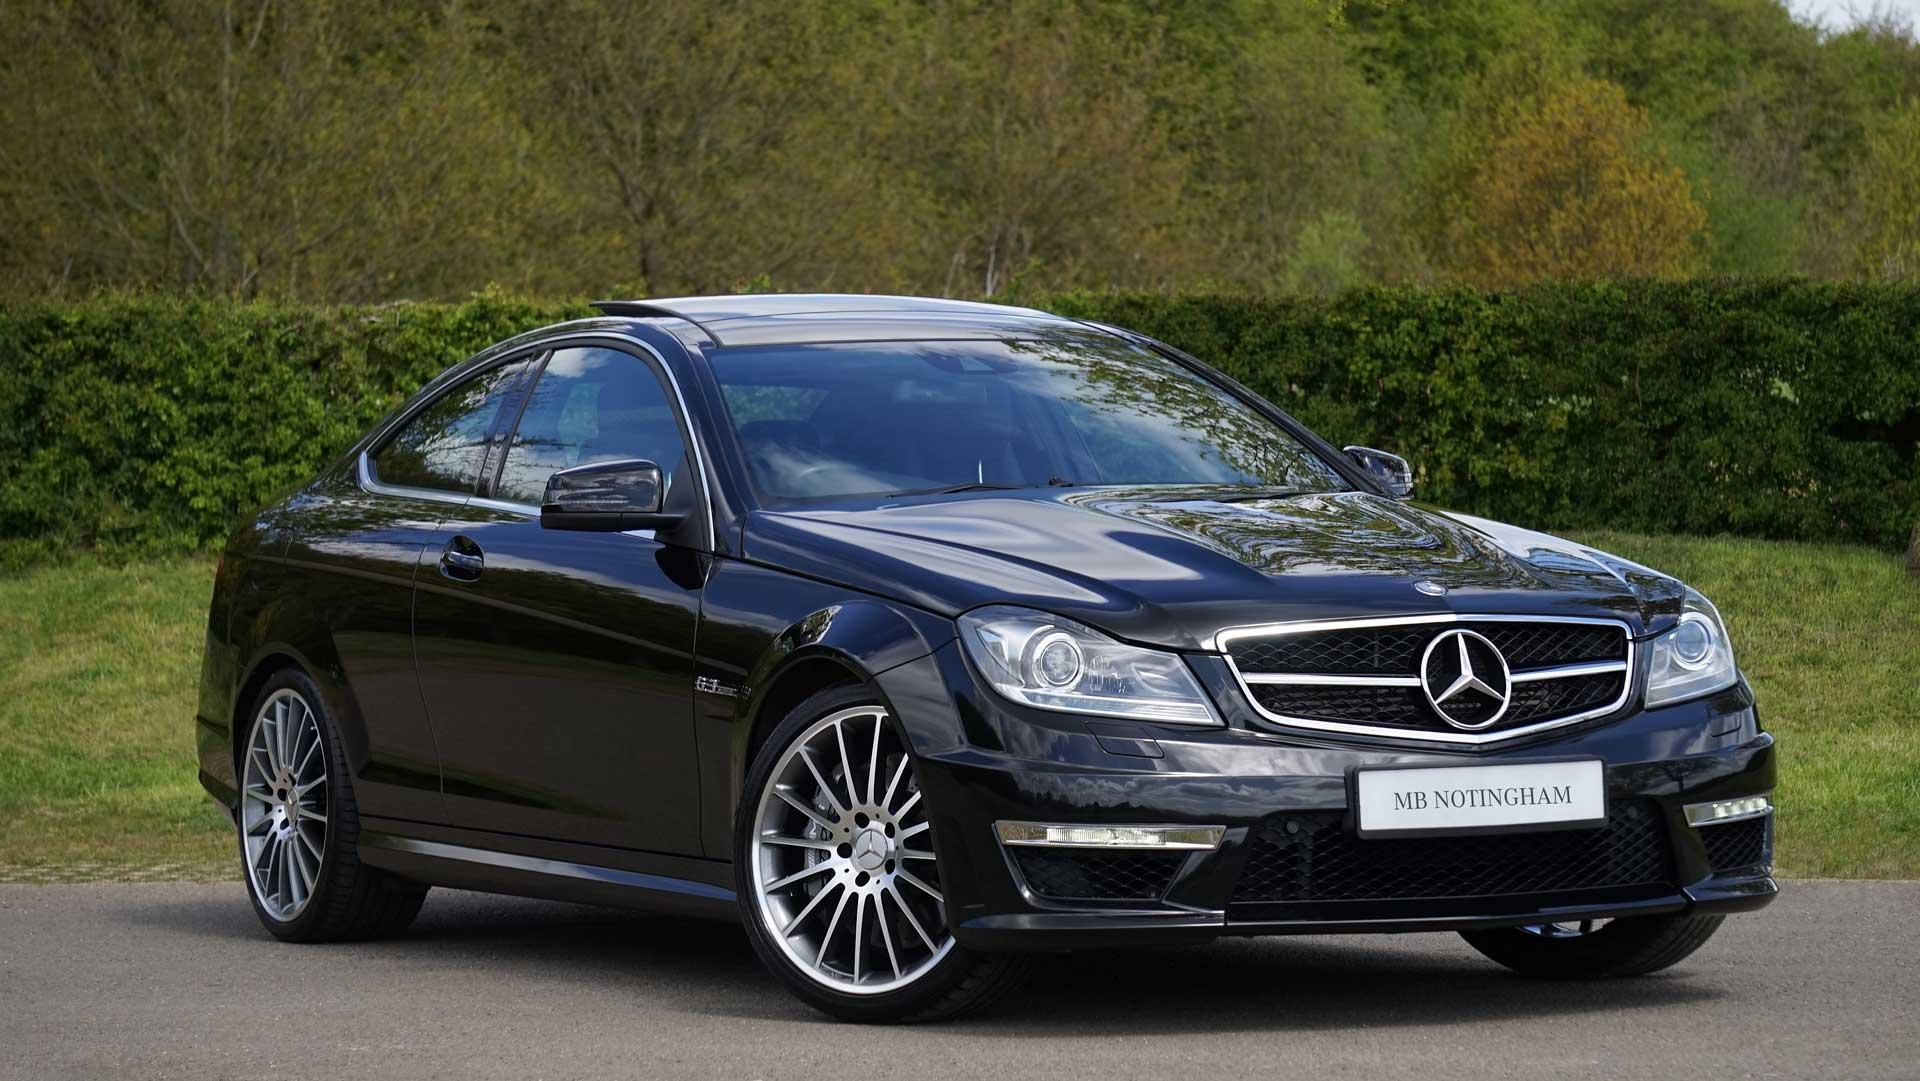 Black Mercedes Benz with MB Nottingham Number plate